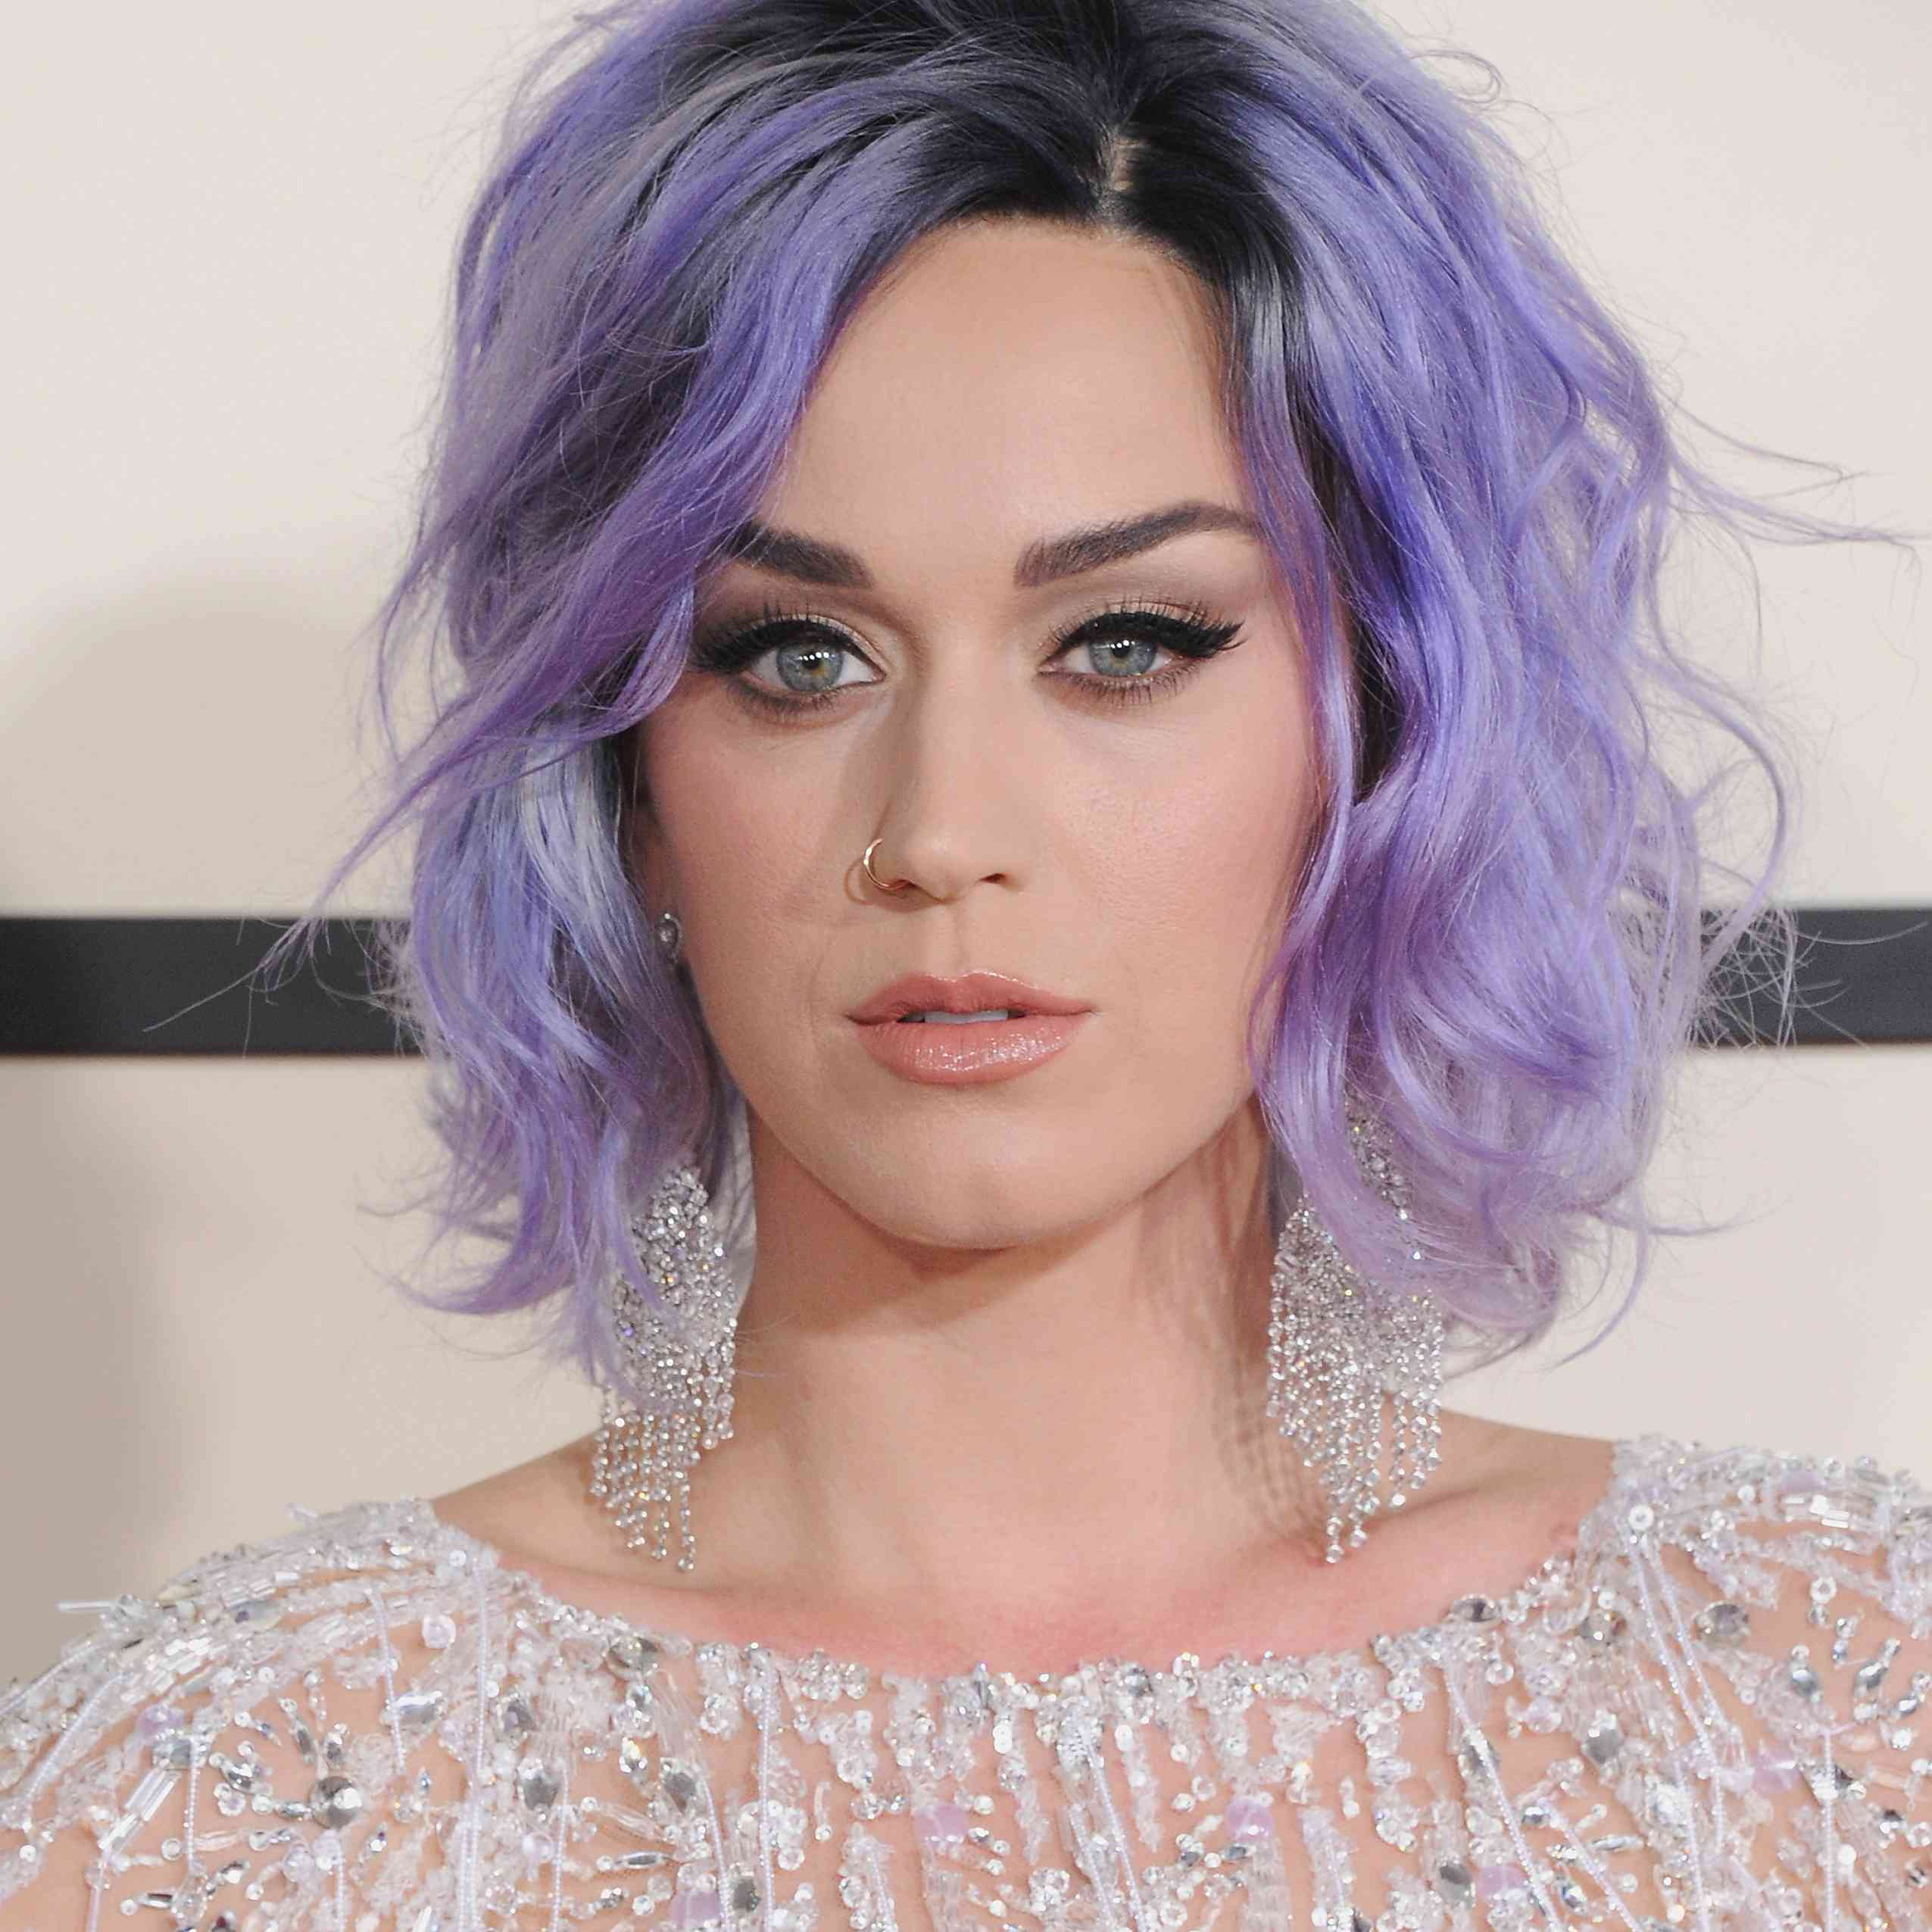 Purple hair: Katy Perry